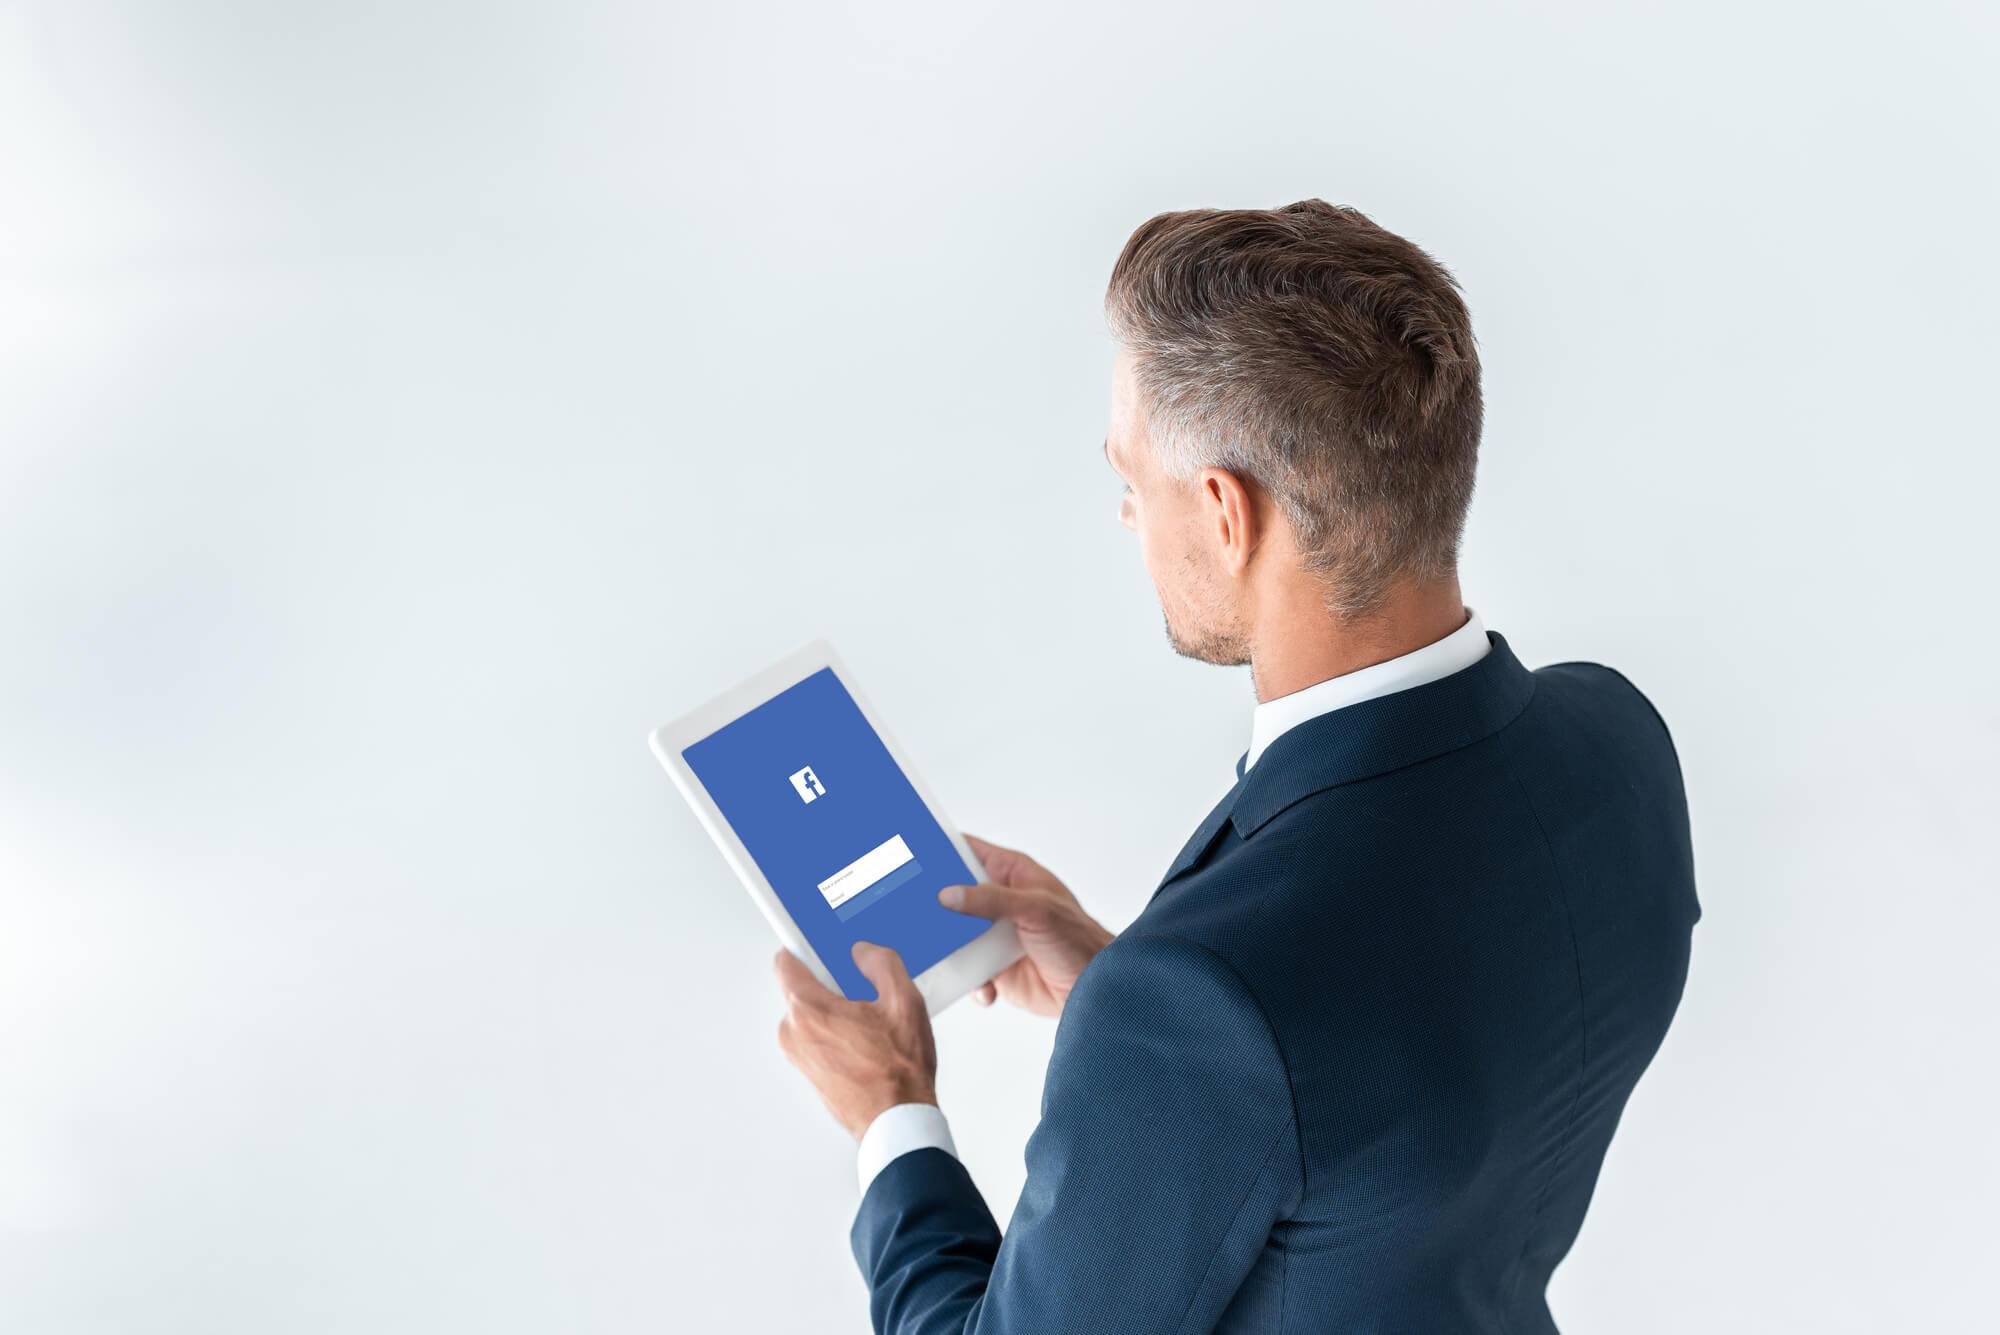 businessman-holding-tablet-with-facebook-login